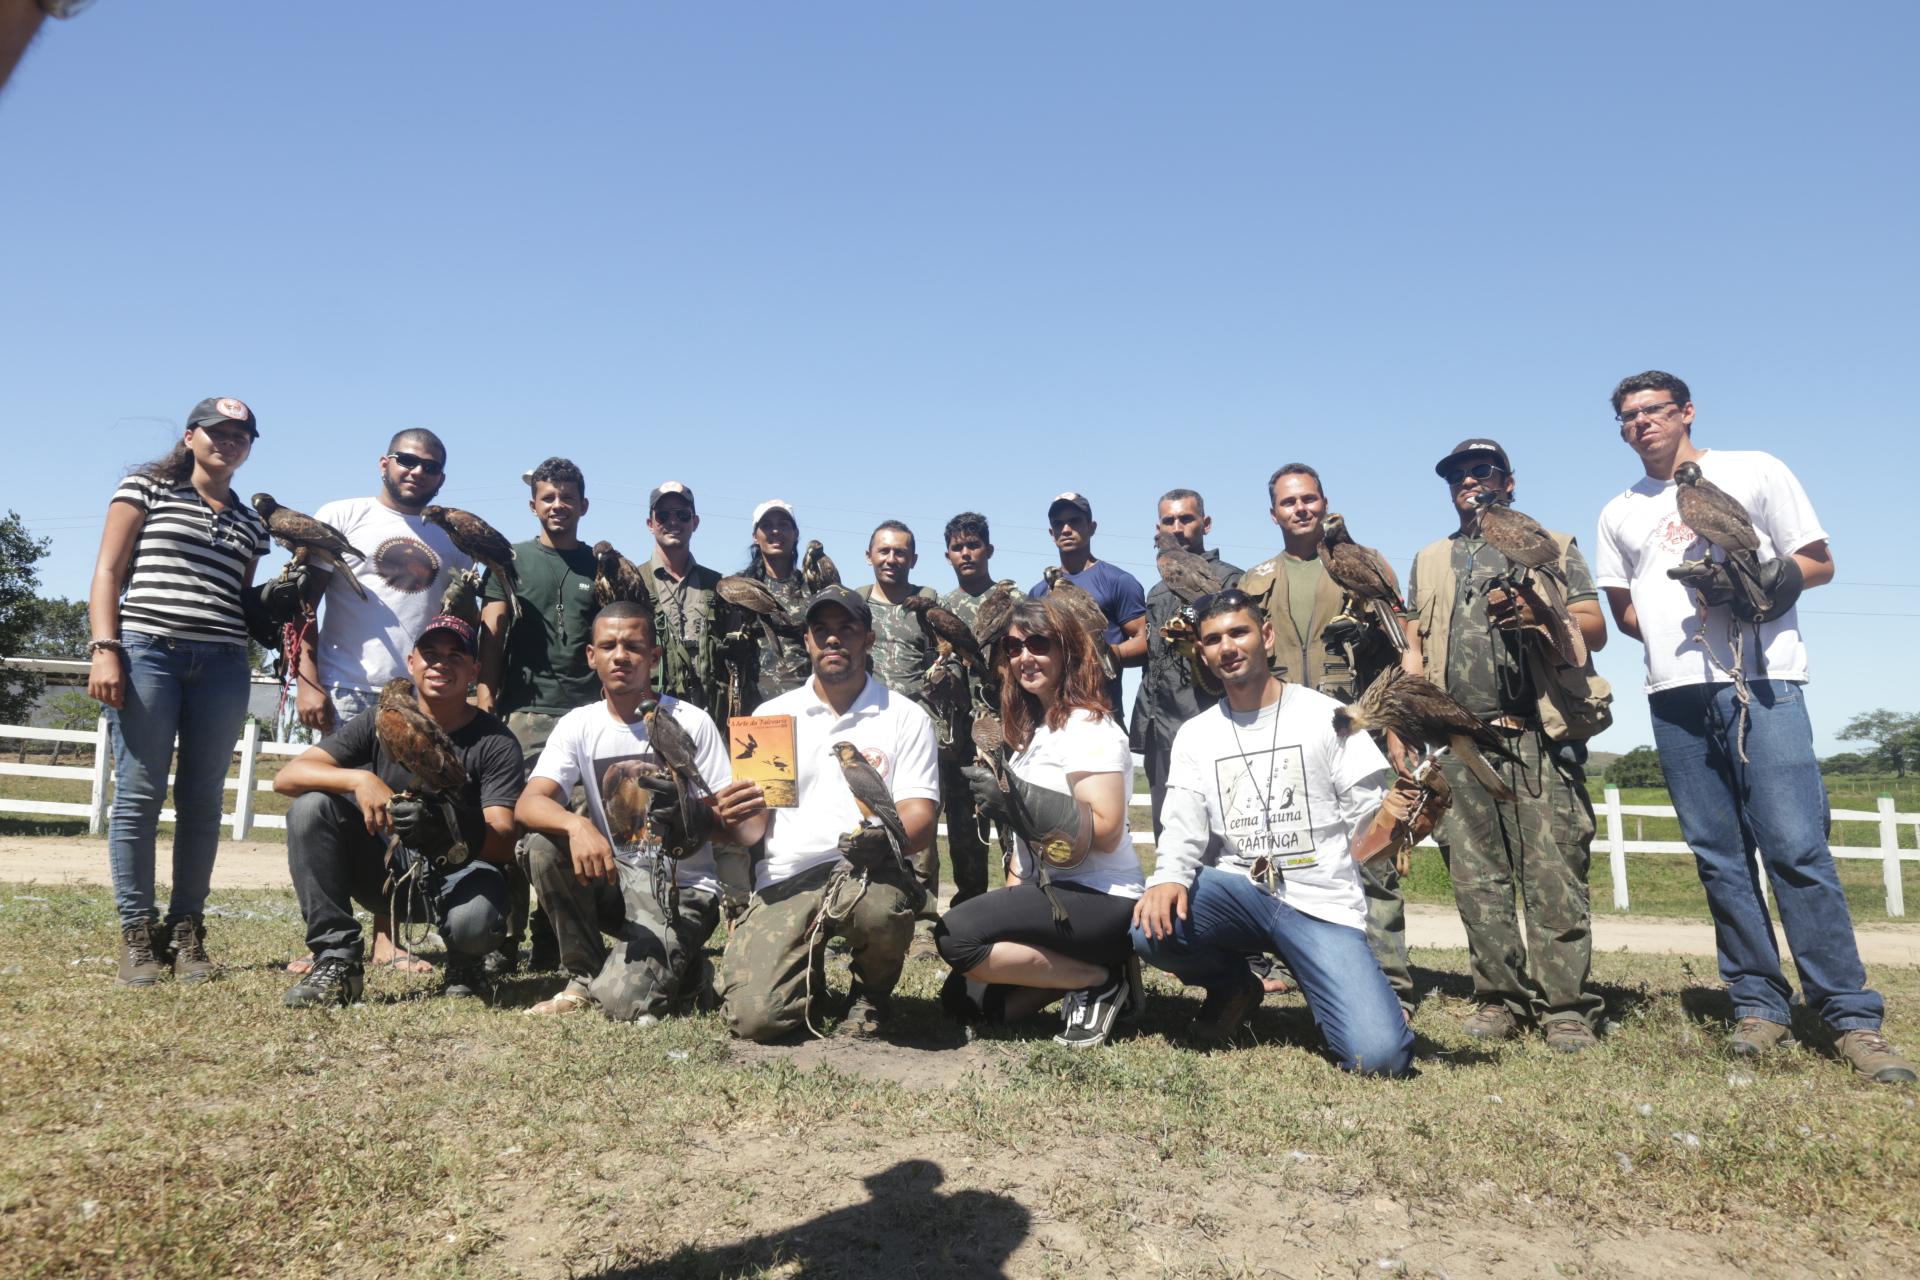 Mini encontro de Falcoaria promovido pela ANF, 2015